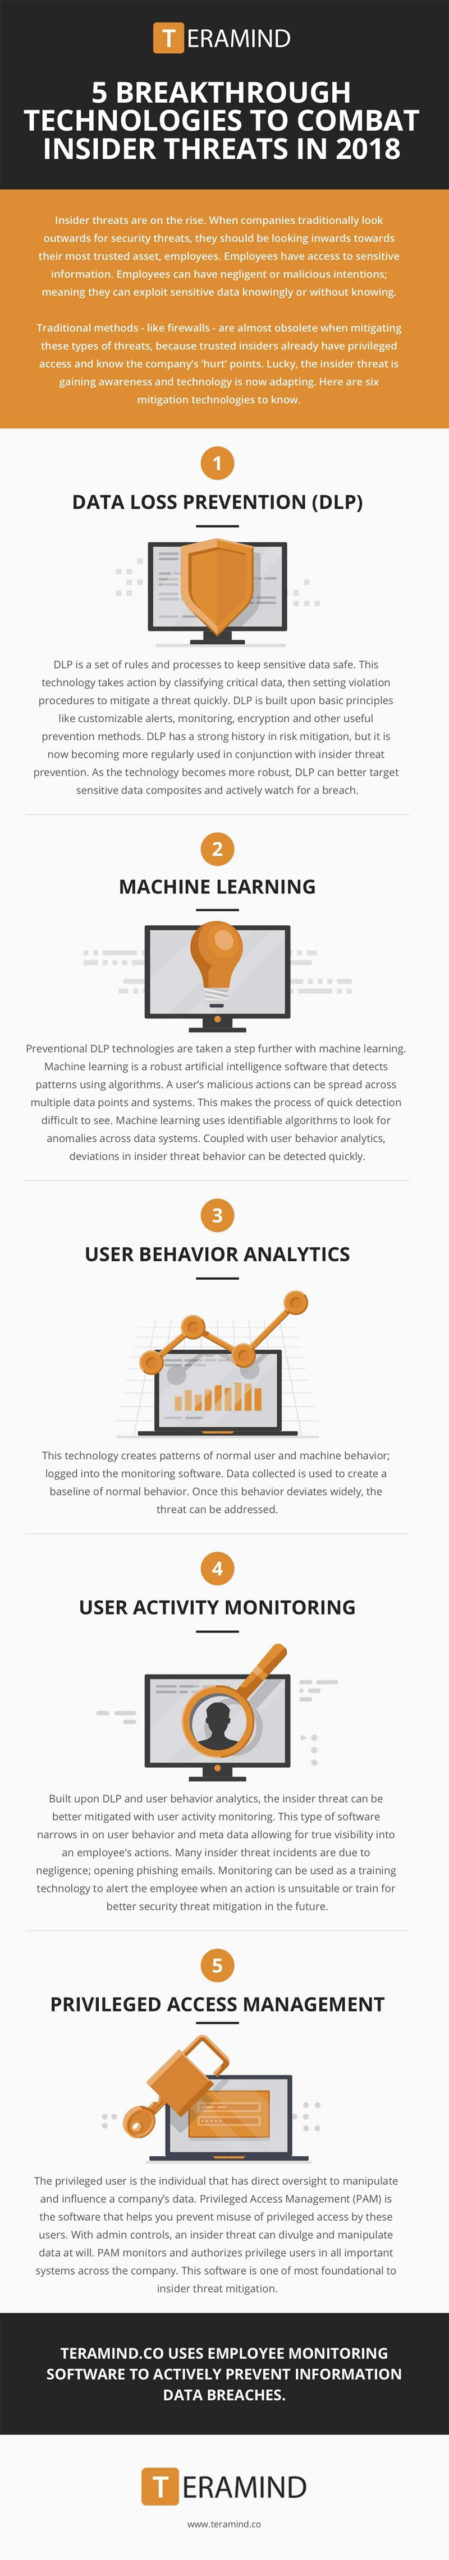 combat insider threats infographic